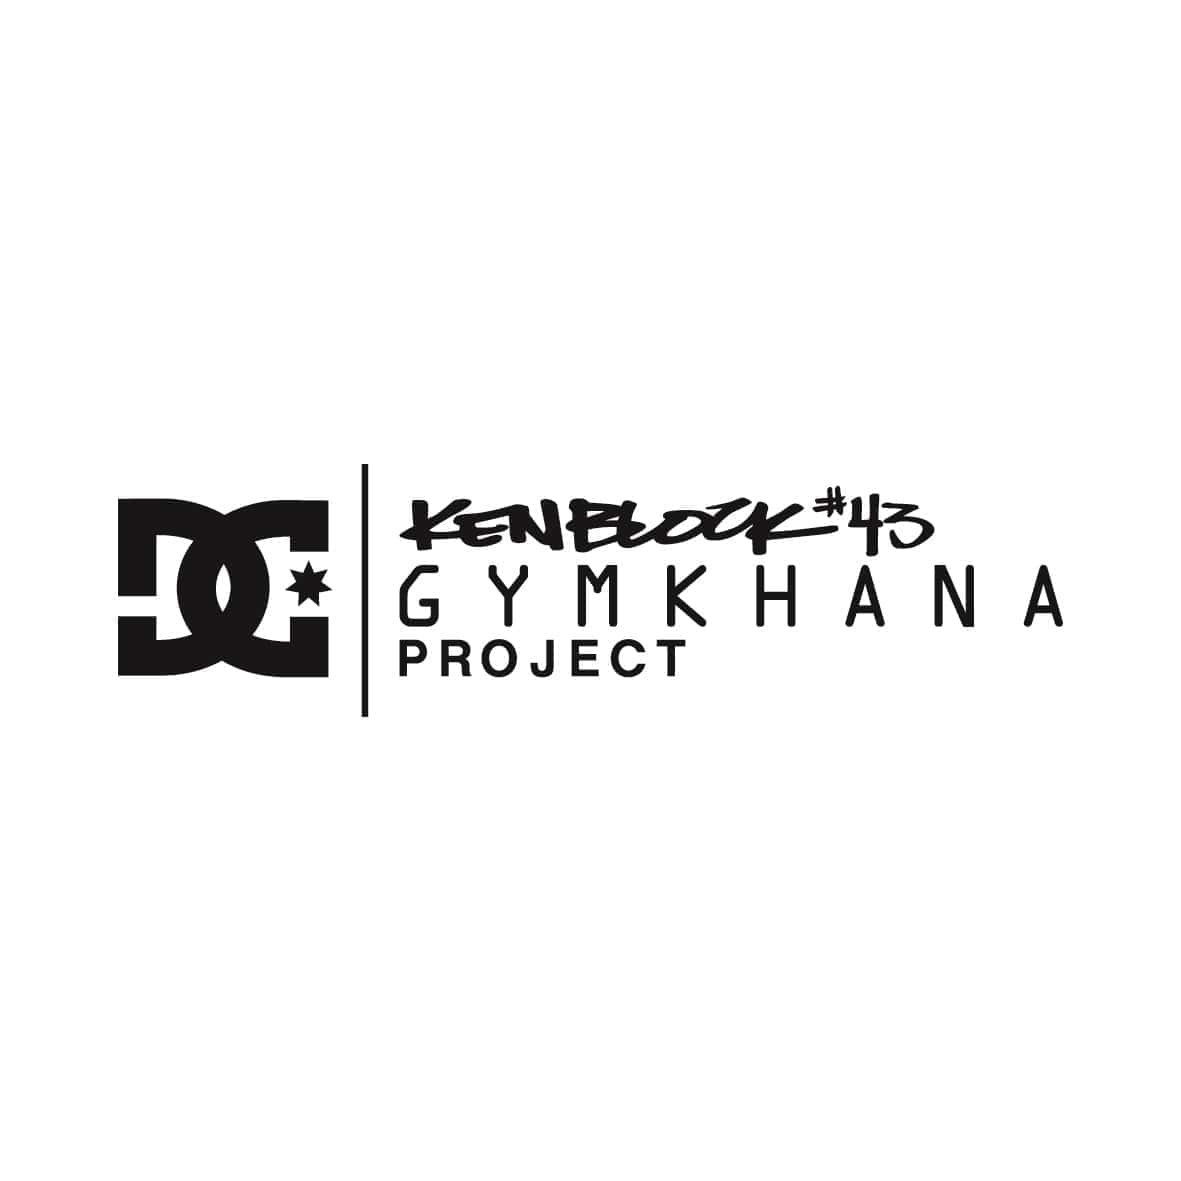 dc-shoes-ref10-ken-block-43-gymkhana-skate-snow-tuning-sport-automobile-racing-shoes-chaussure-sponsors-min-min